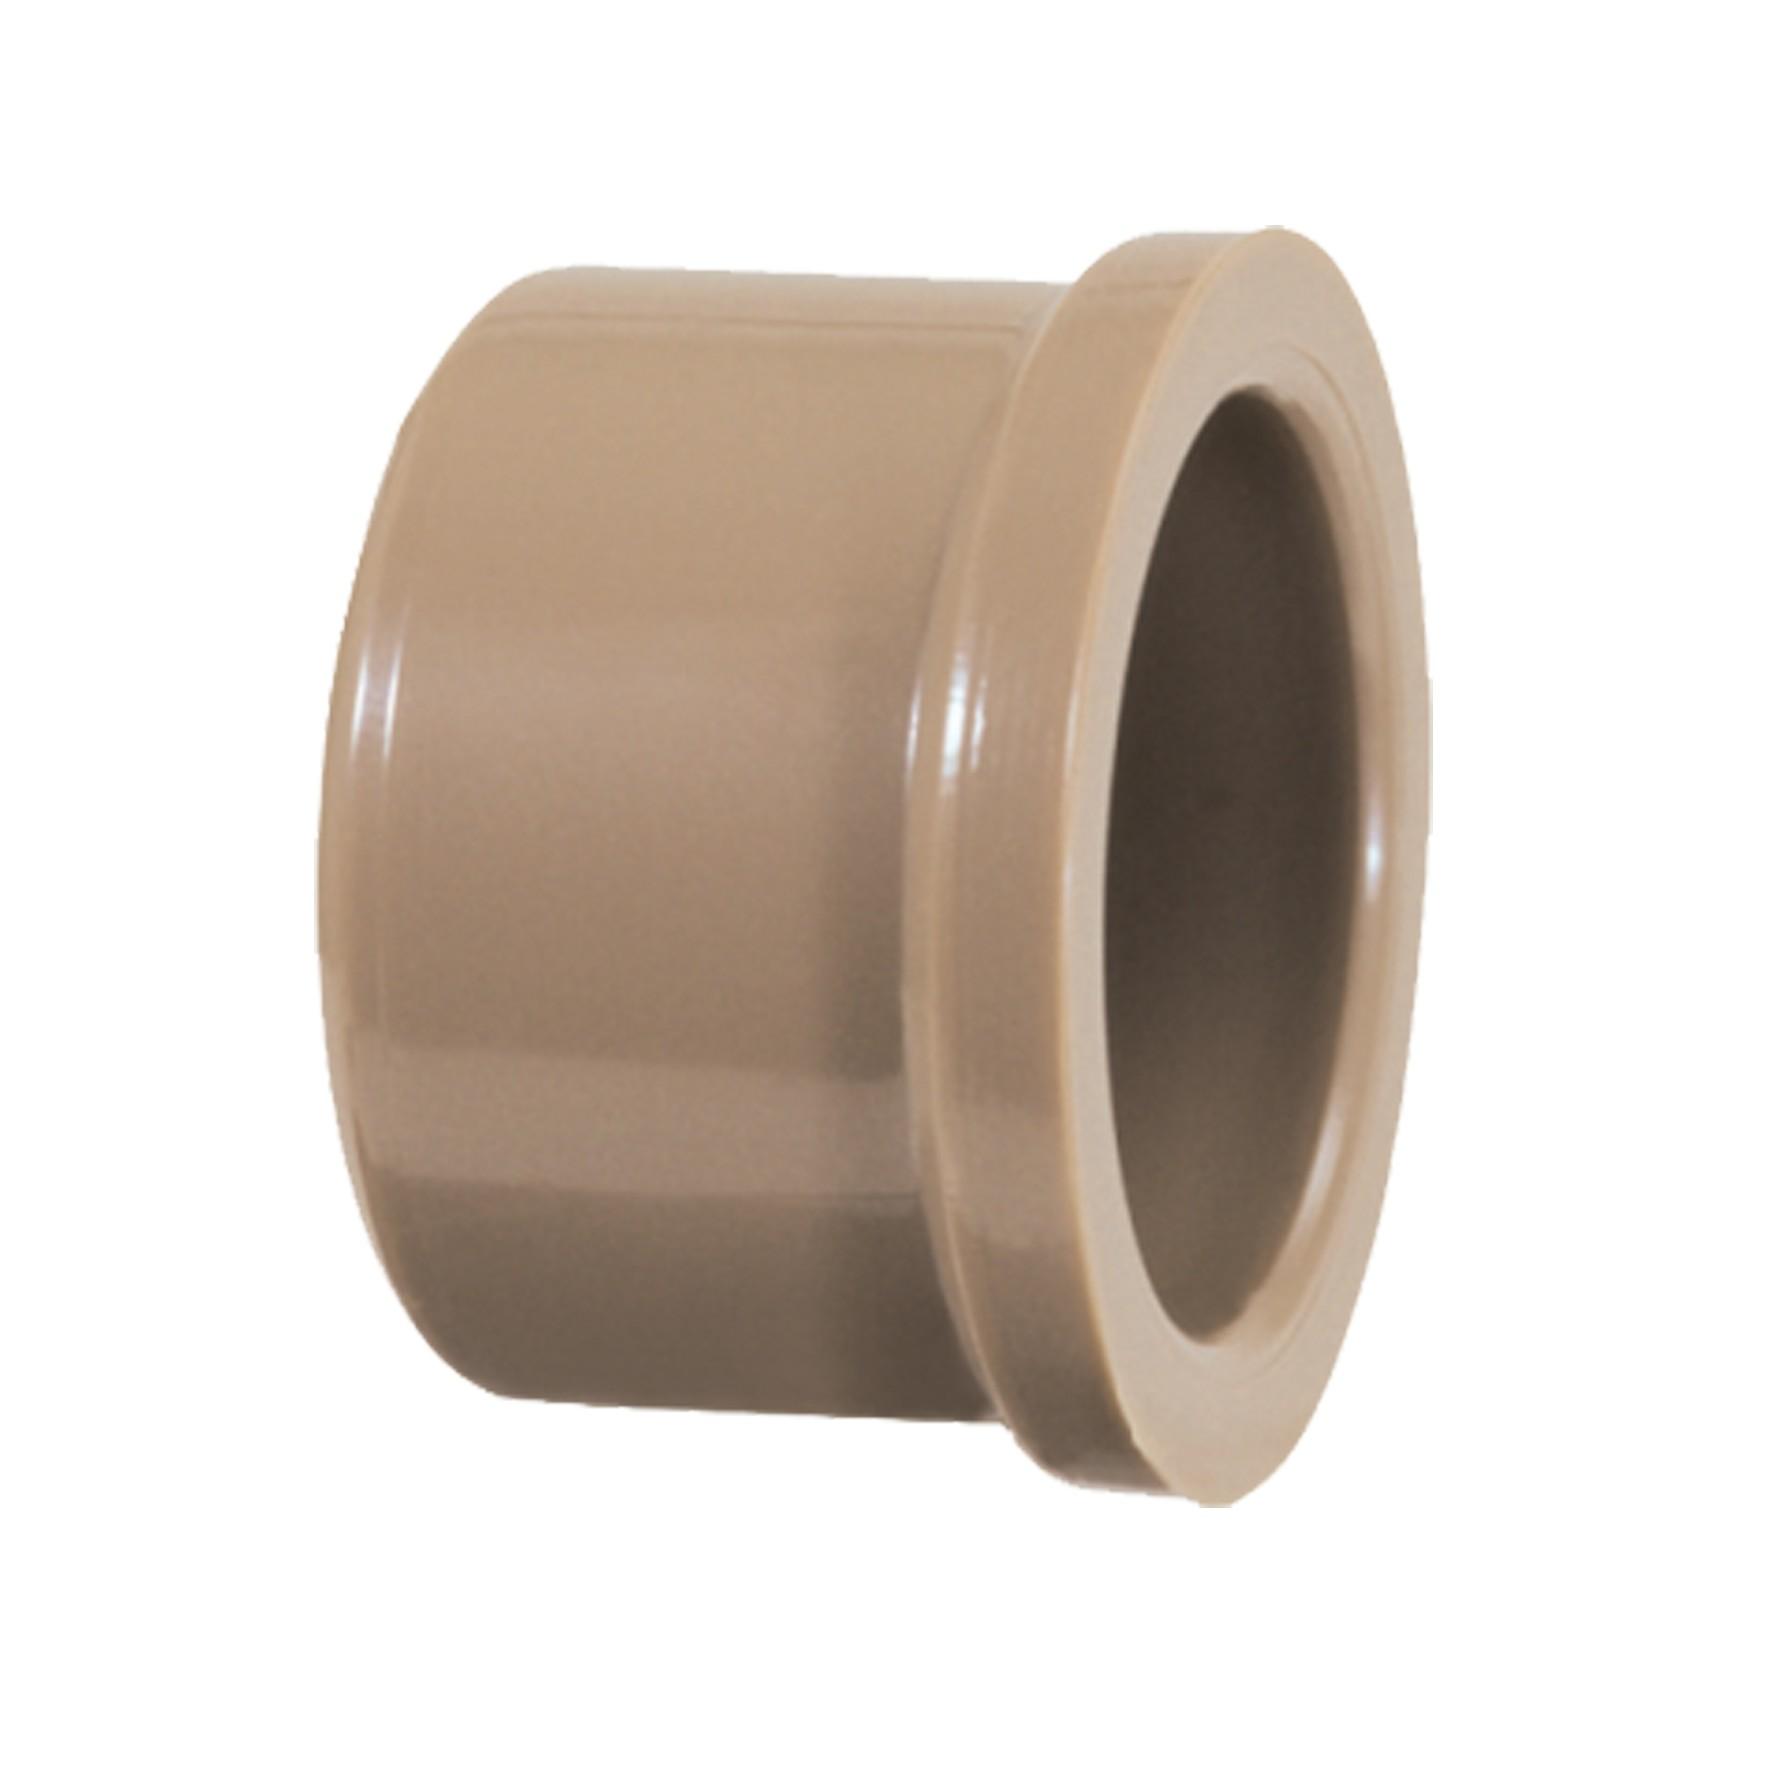 Cap Simples Soldavel PVC 60mm - Krona